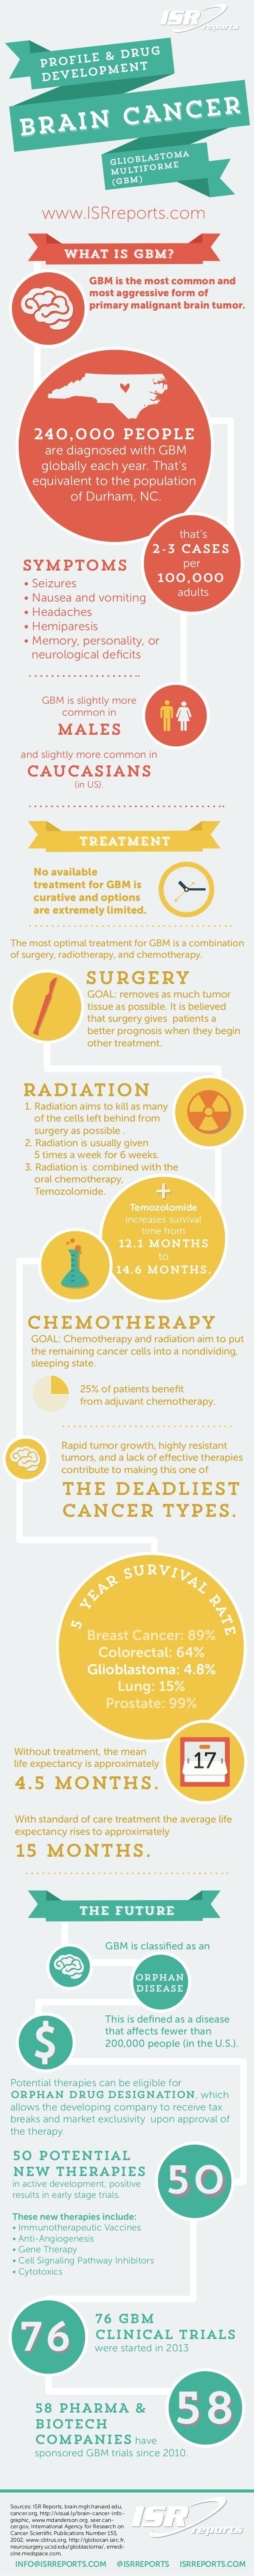 Brain Cancer (Glioblastoma Multiforme): Profile & Drug Development